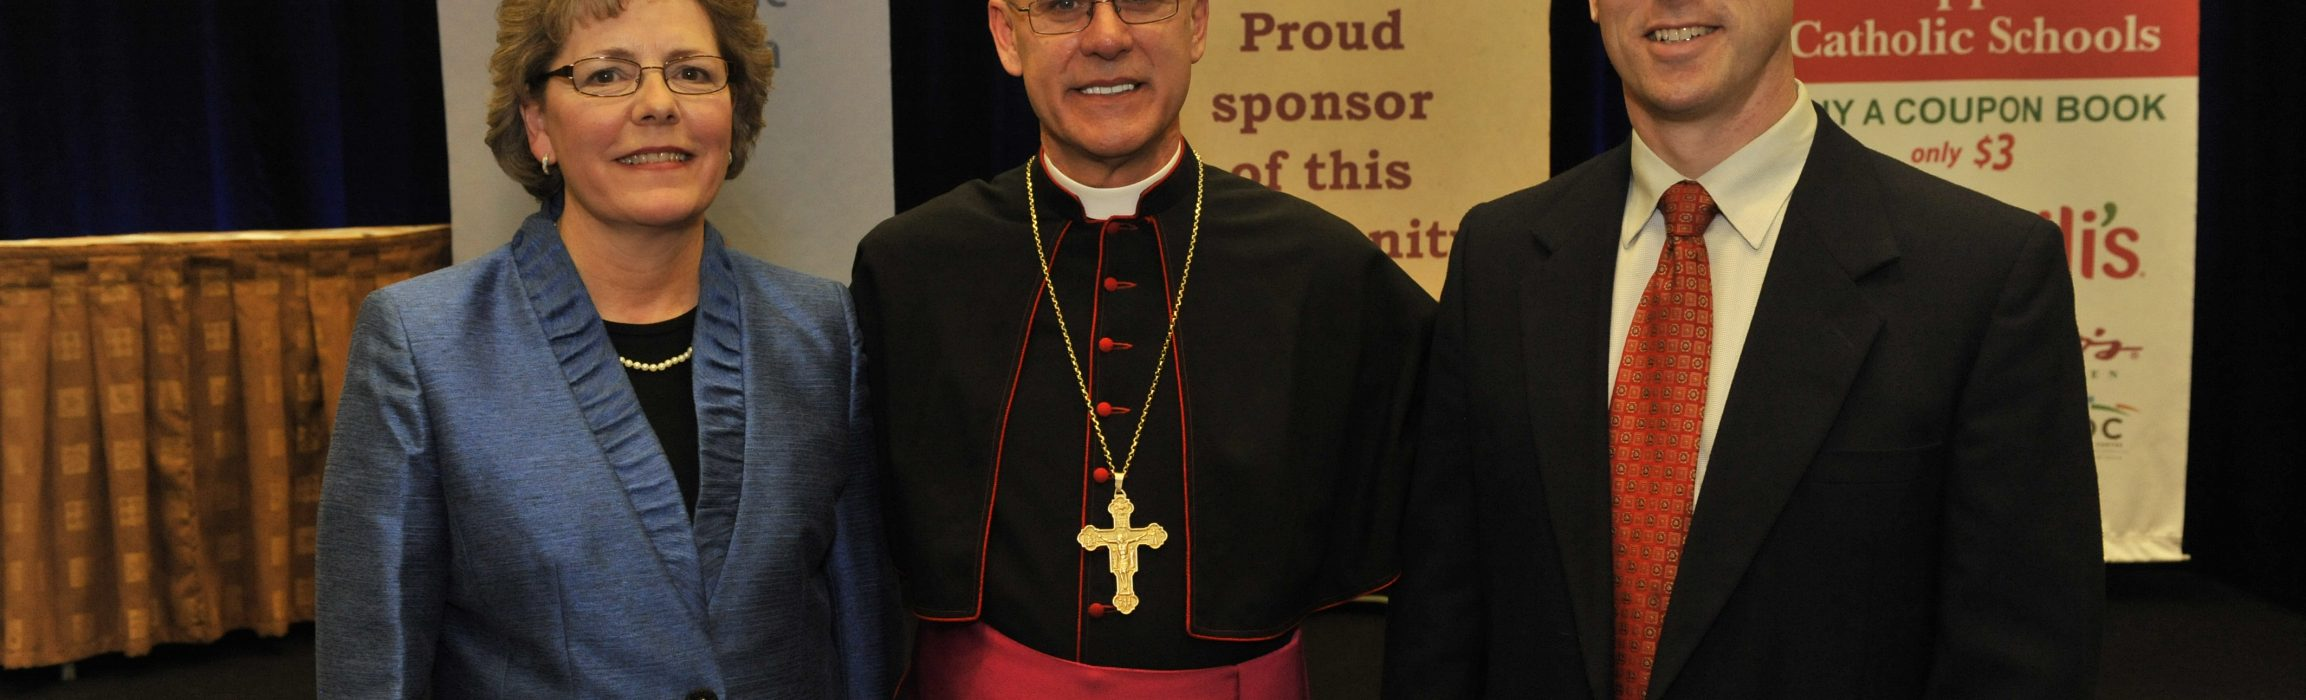 Carl loesch appointed secretary of catholic education jordan to be carl loesch appointed secretary of catholic education jordan to be superintendent todays catholic m4hsunfo